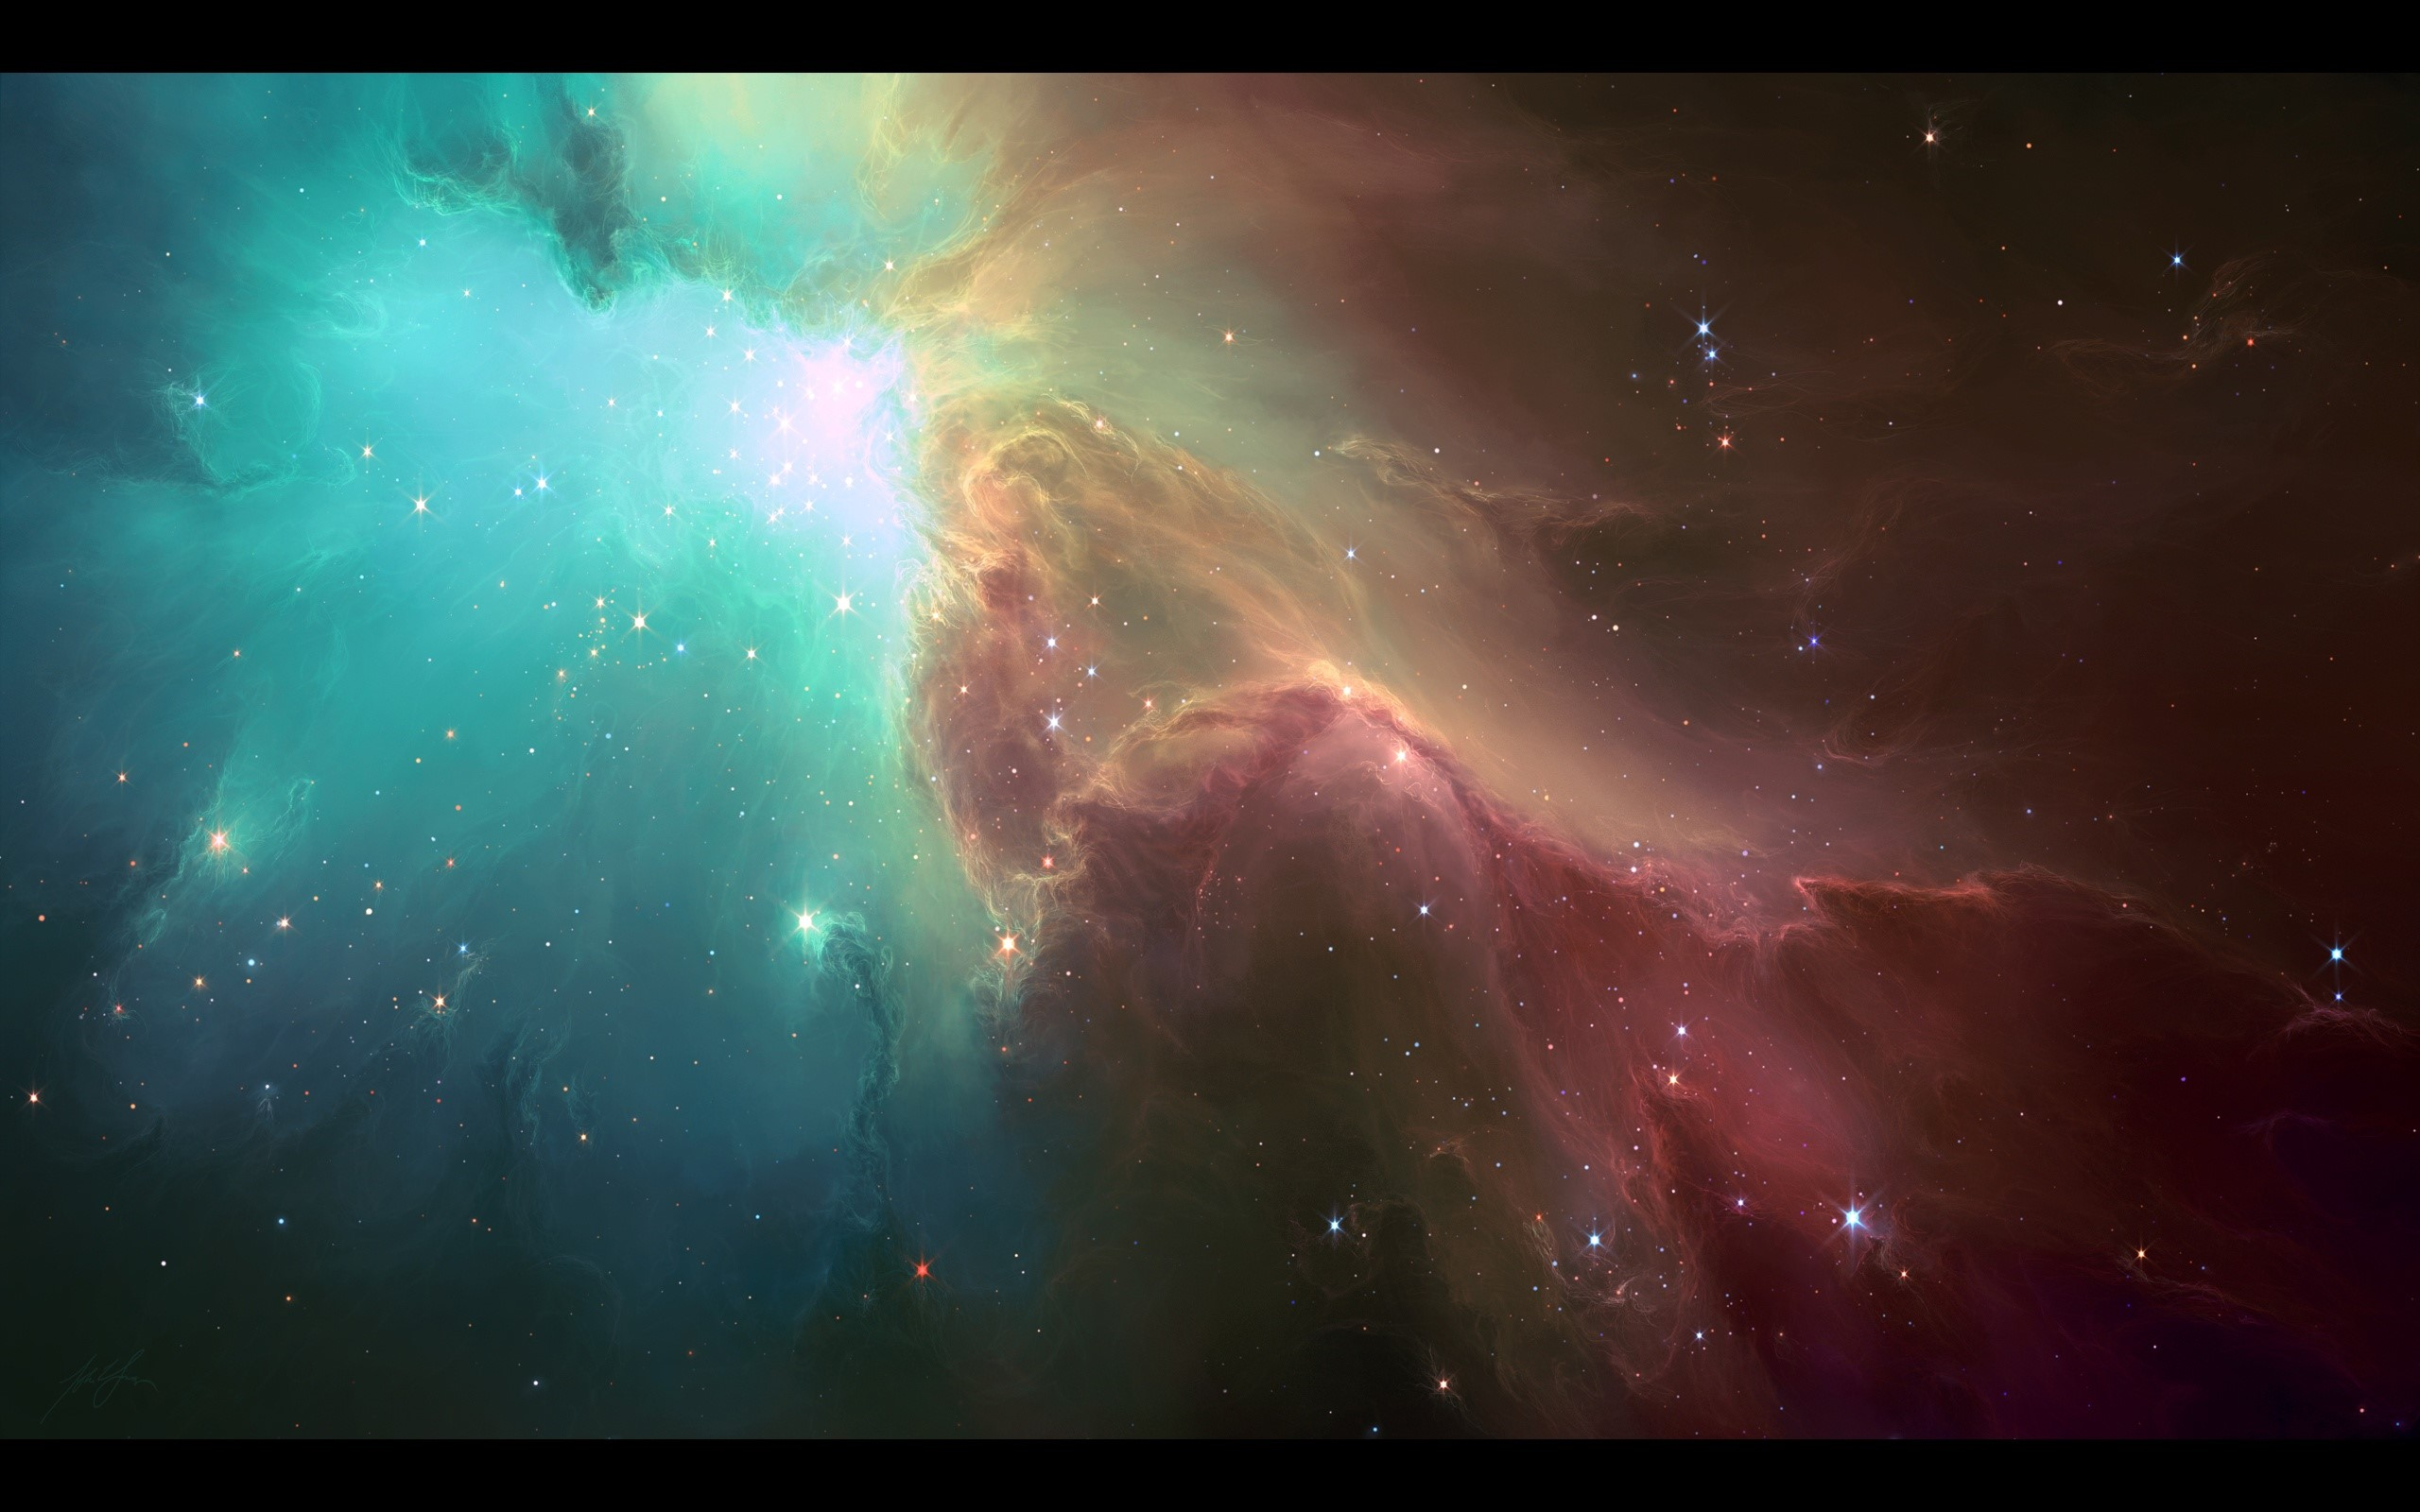 Nebula Fondo De Pantalla 2k Quad Hd Id542